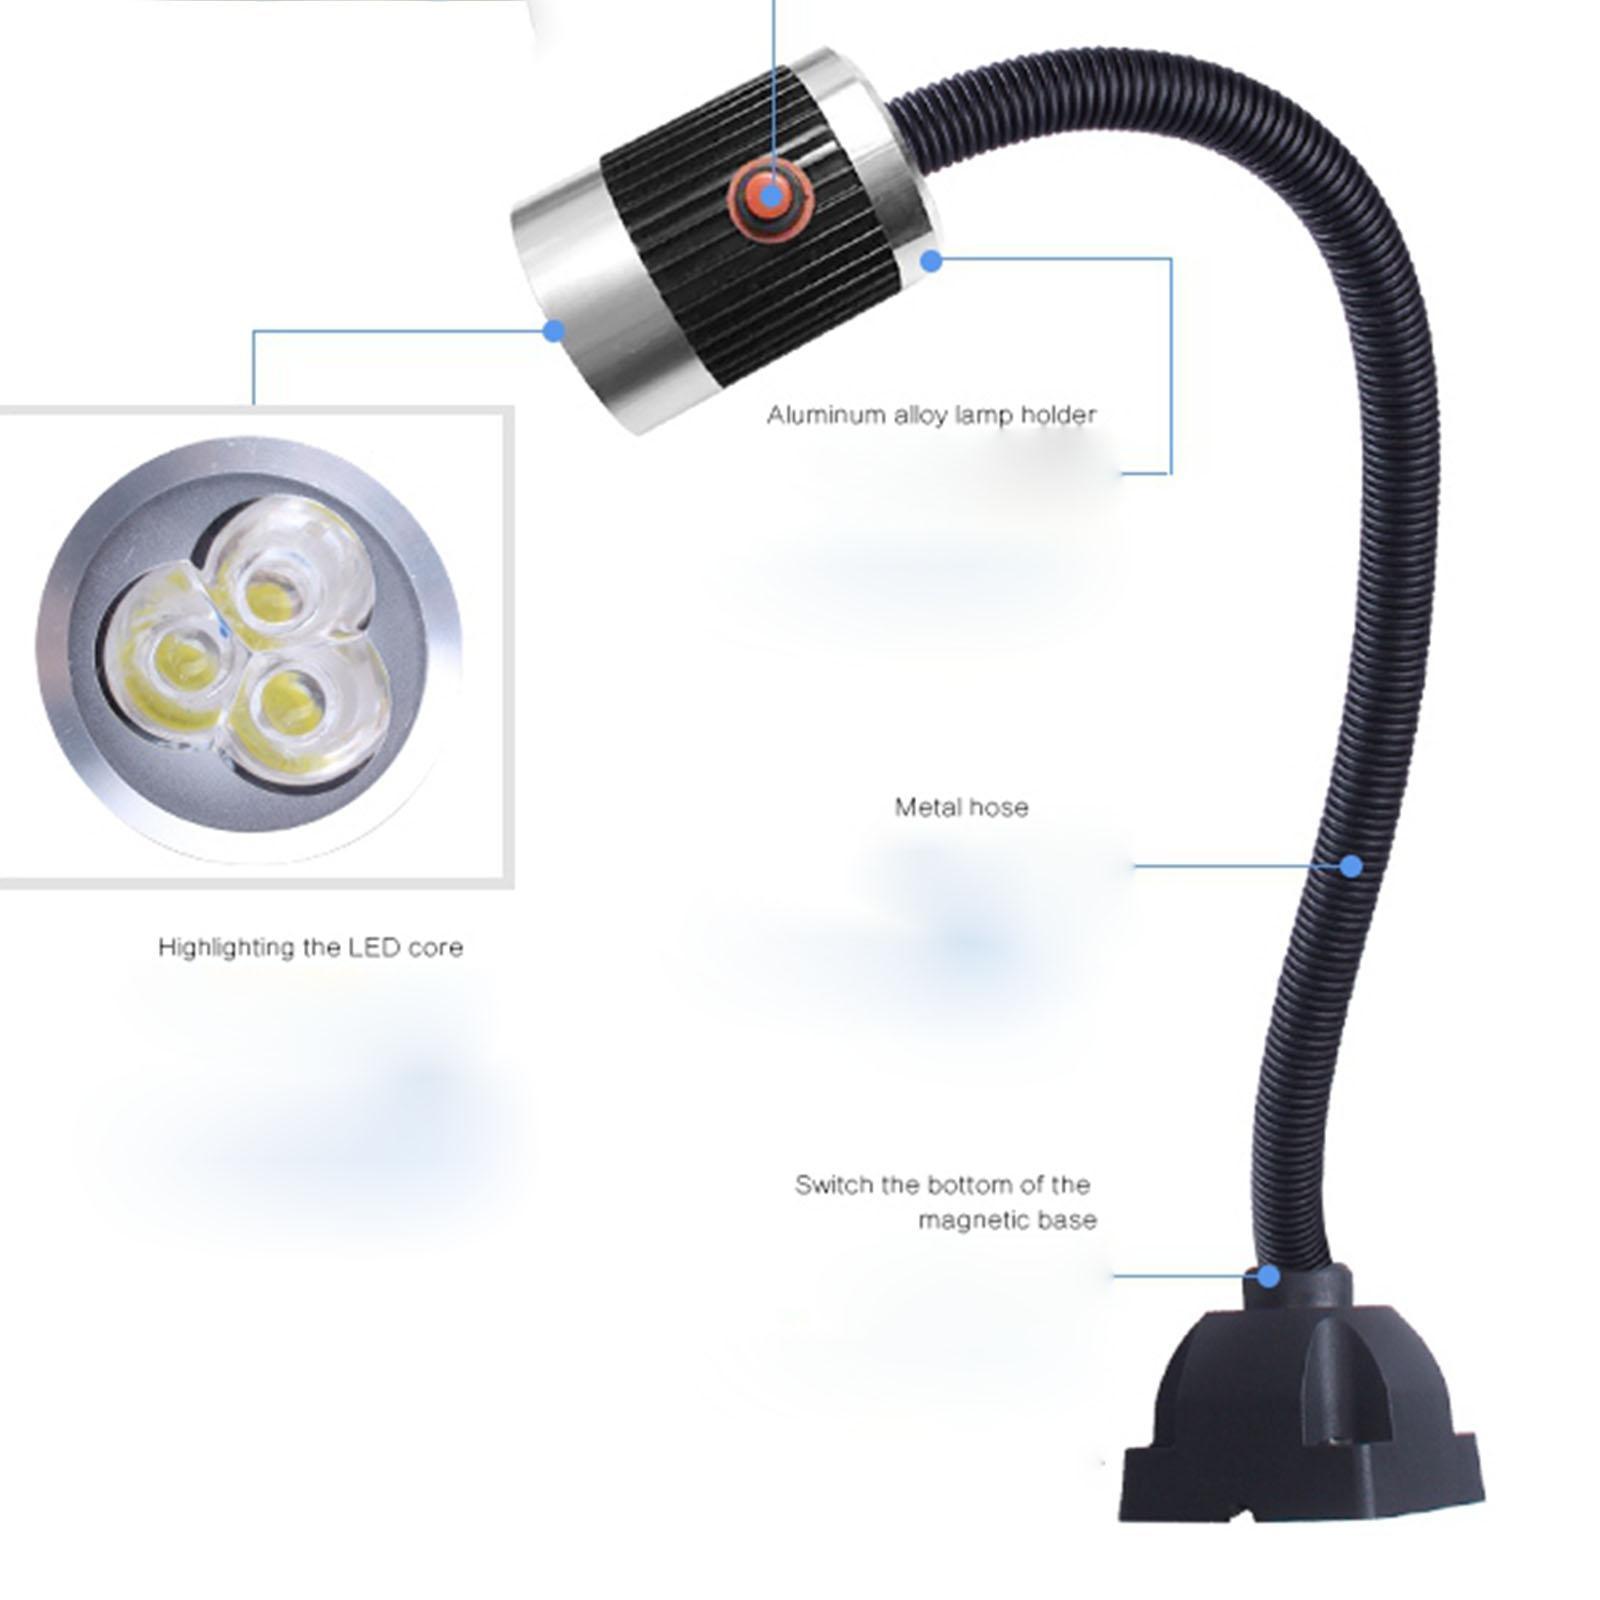 24V/220V 4.5W/6/9W Work Lamp LED CNC Milling Lathe Tool Light Screw Fix Aluminum Alloy And Metal Hose